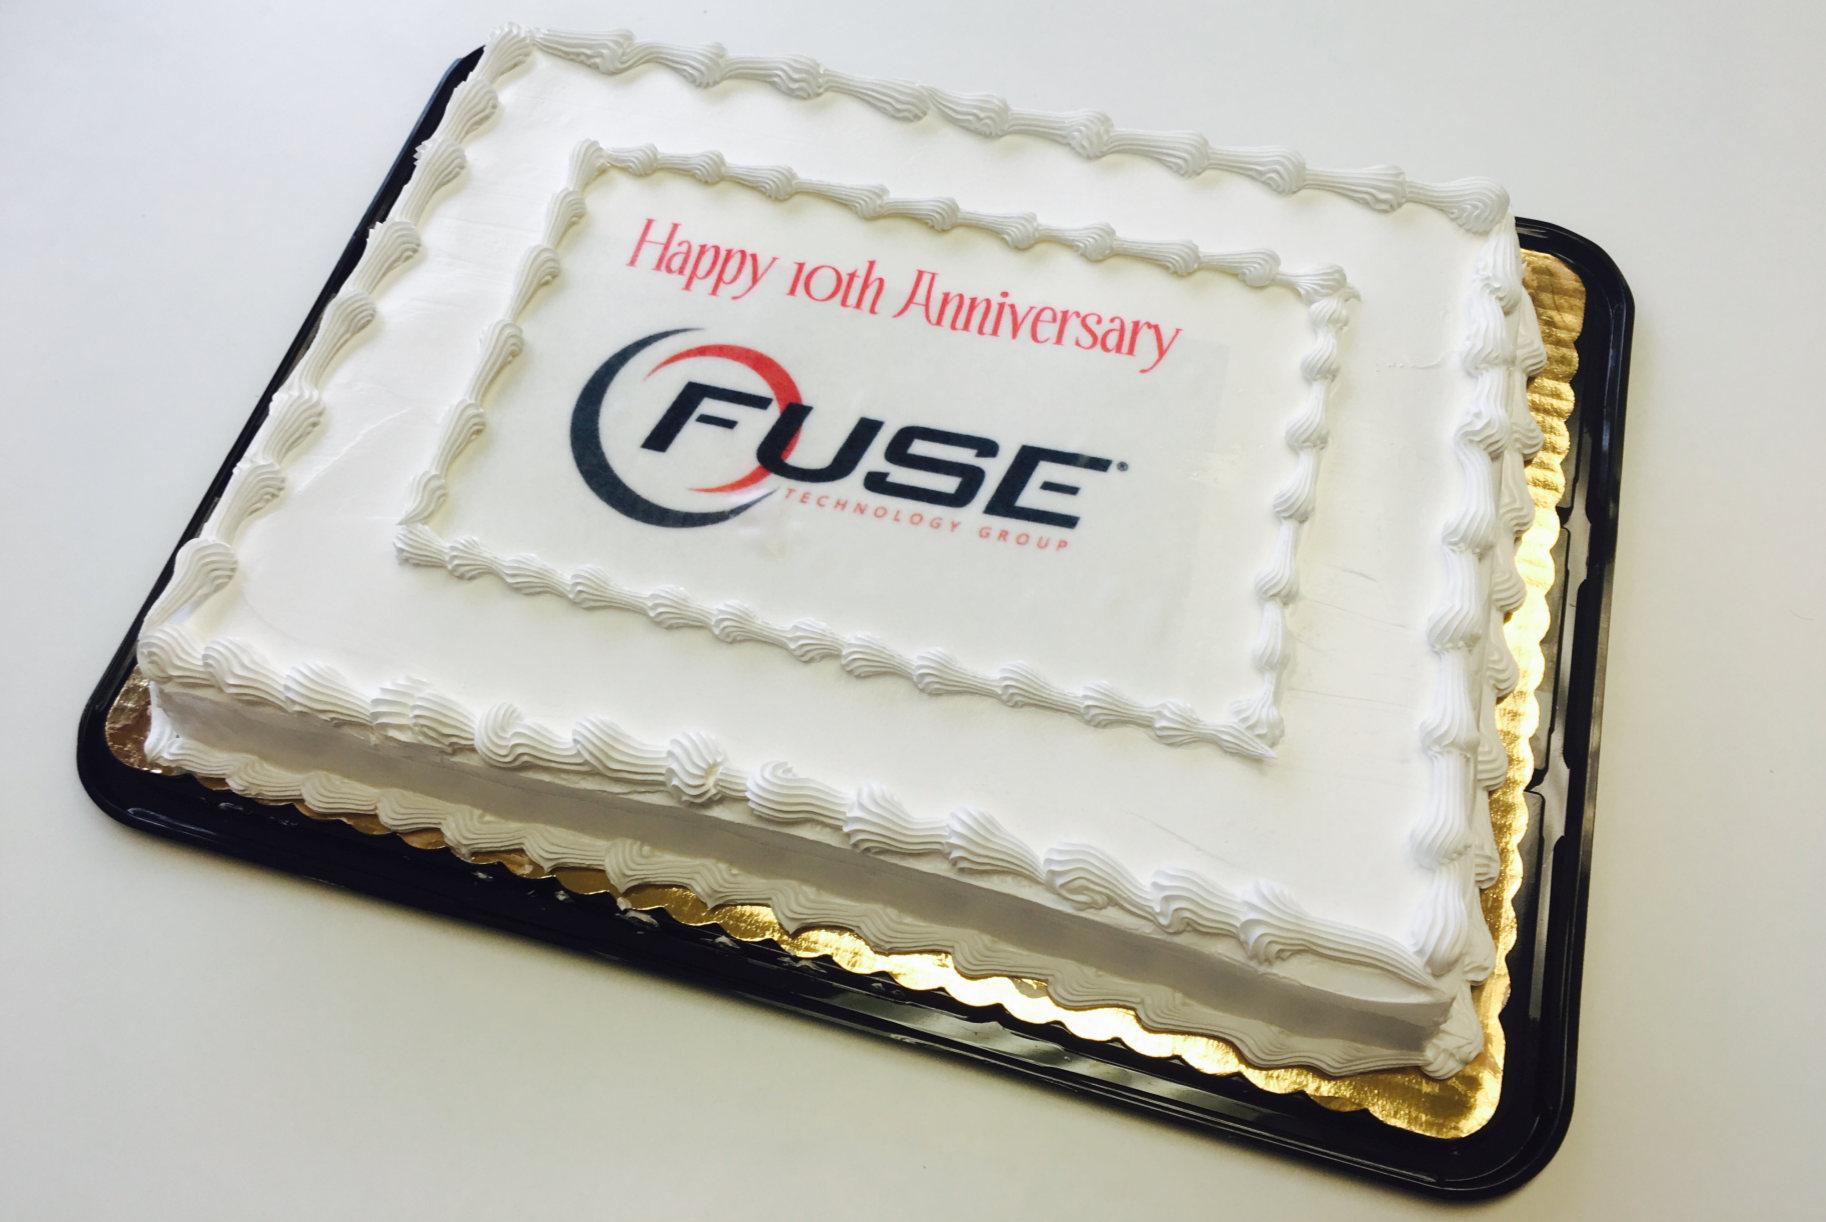 Fuse 10 Year Anniversary